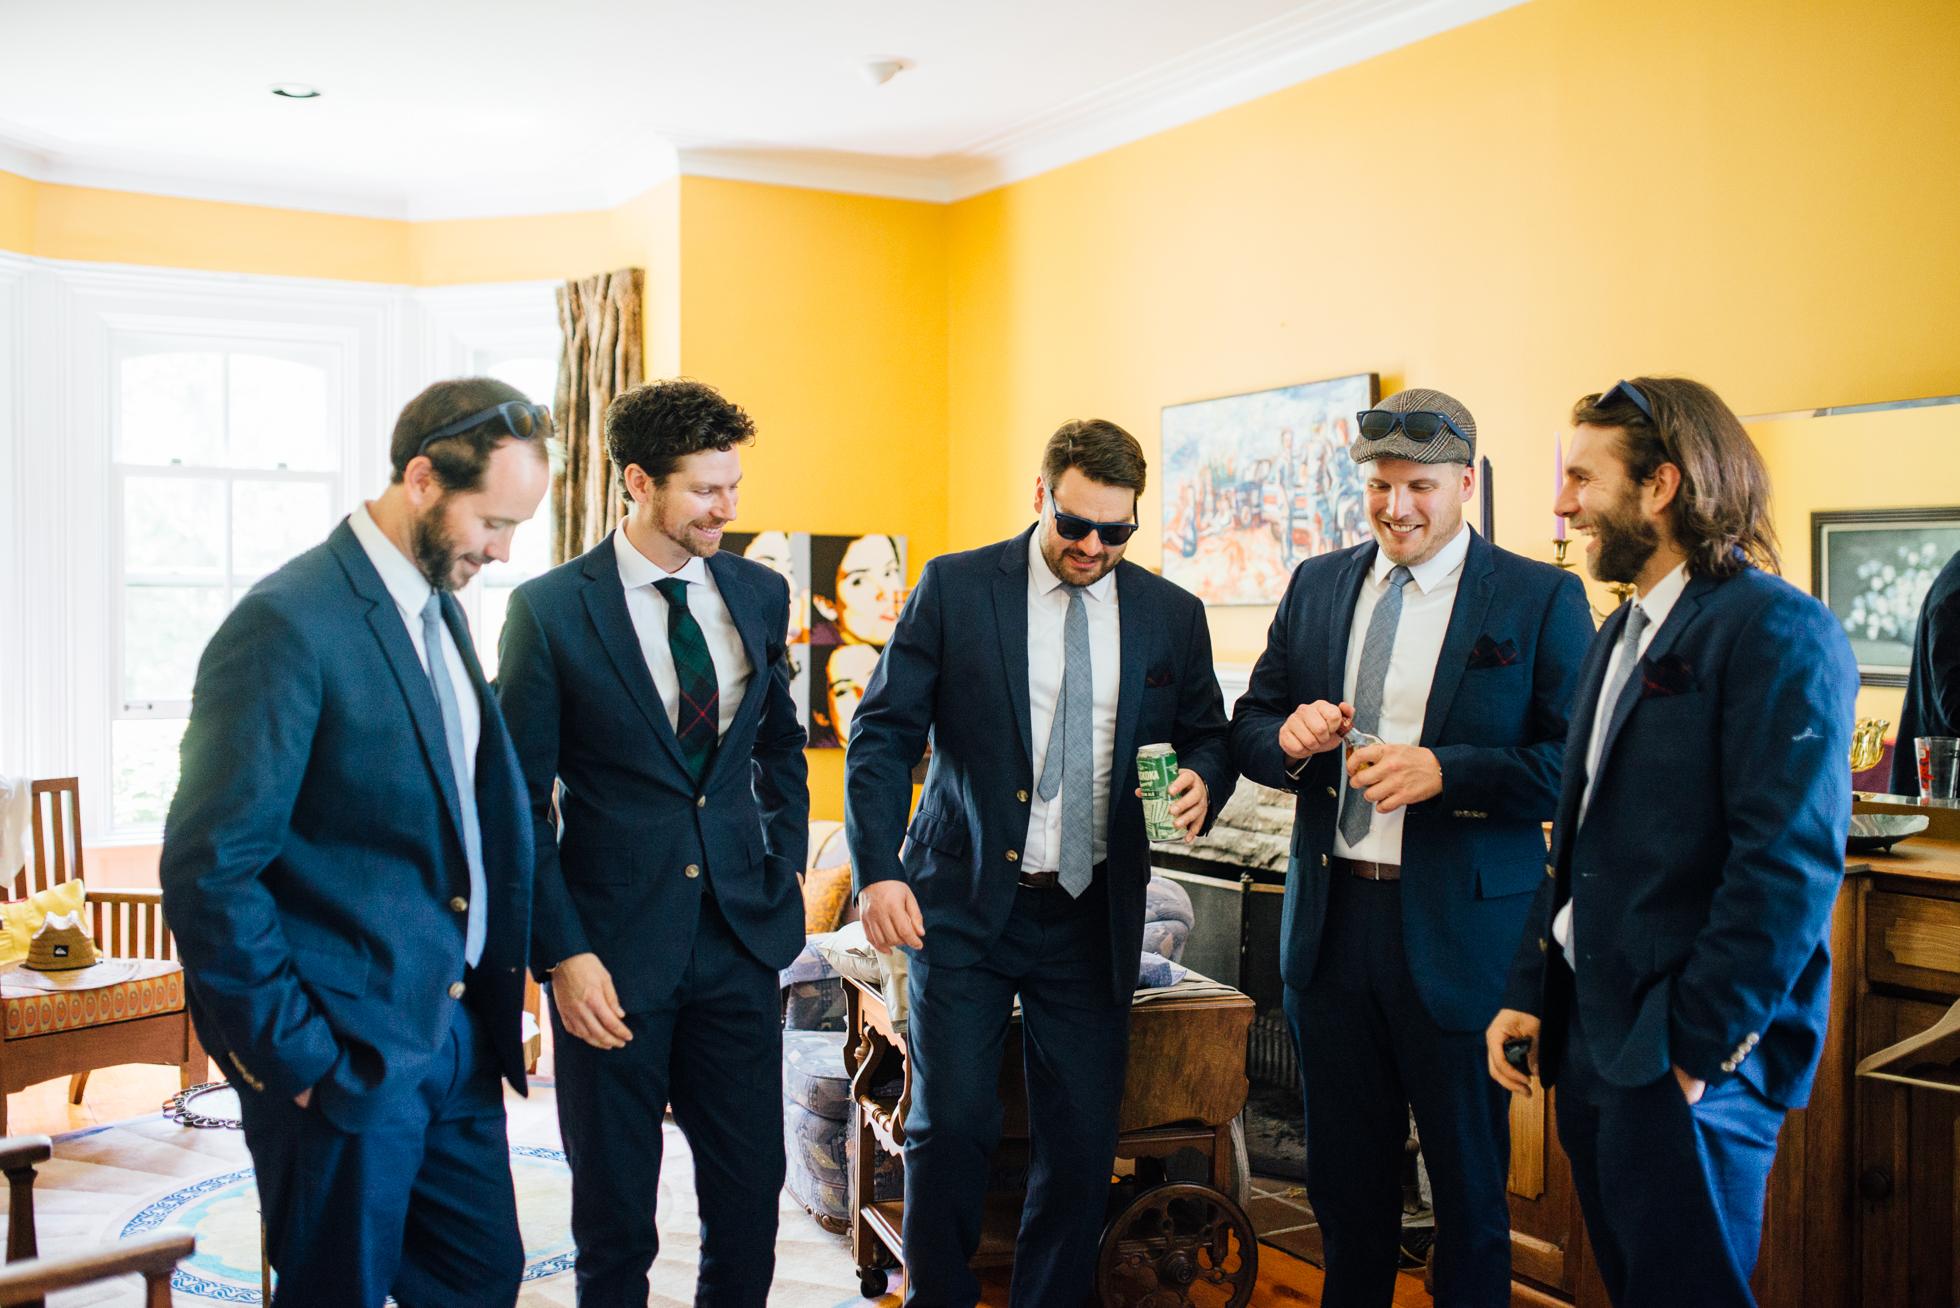 Outdoor-Caledon-Tralee-Wedding-Photography-24